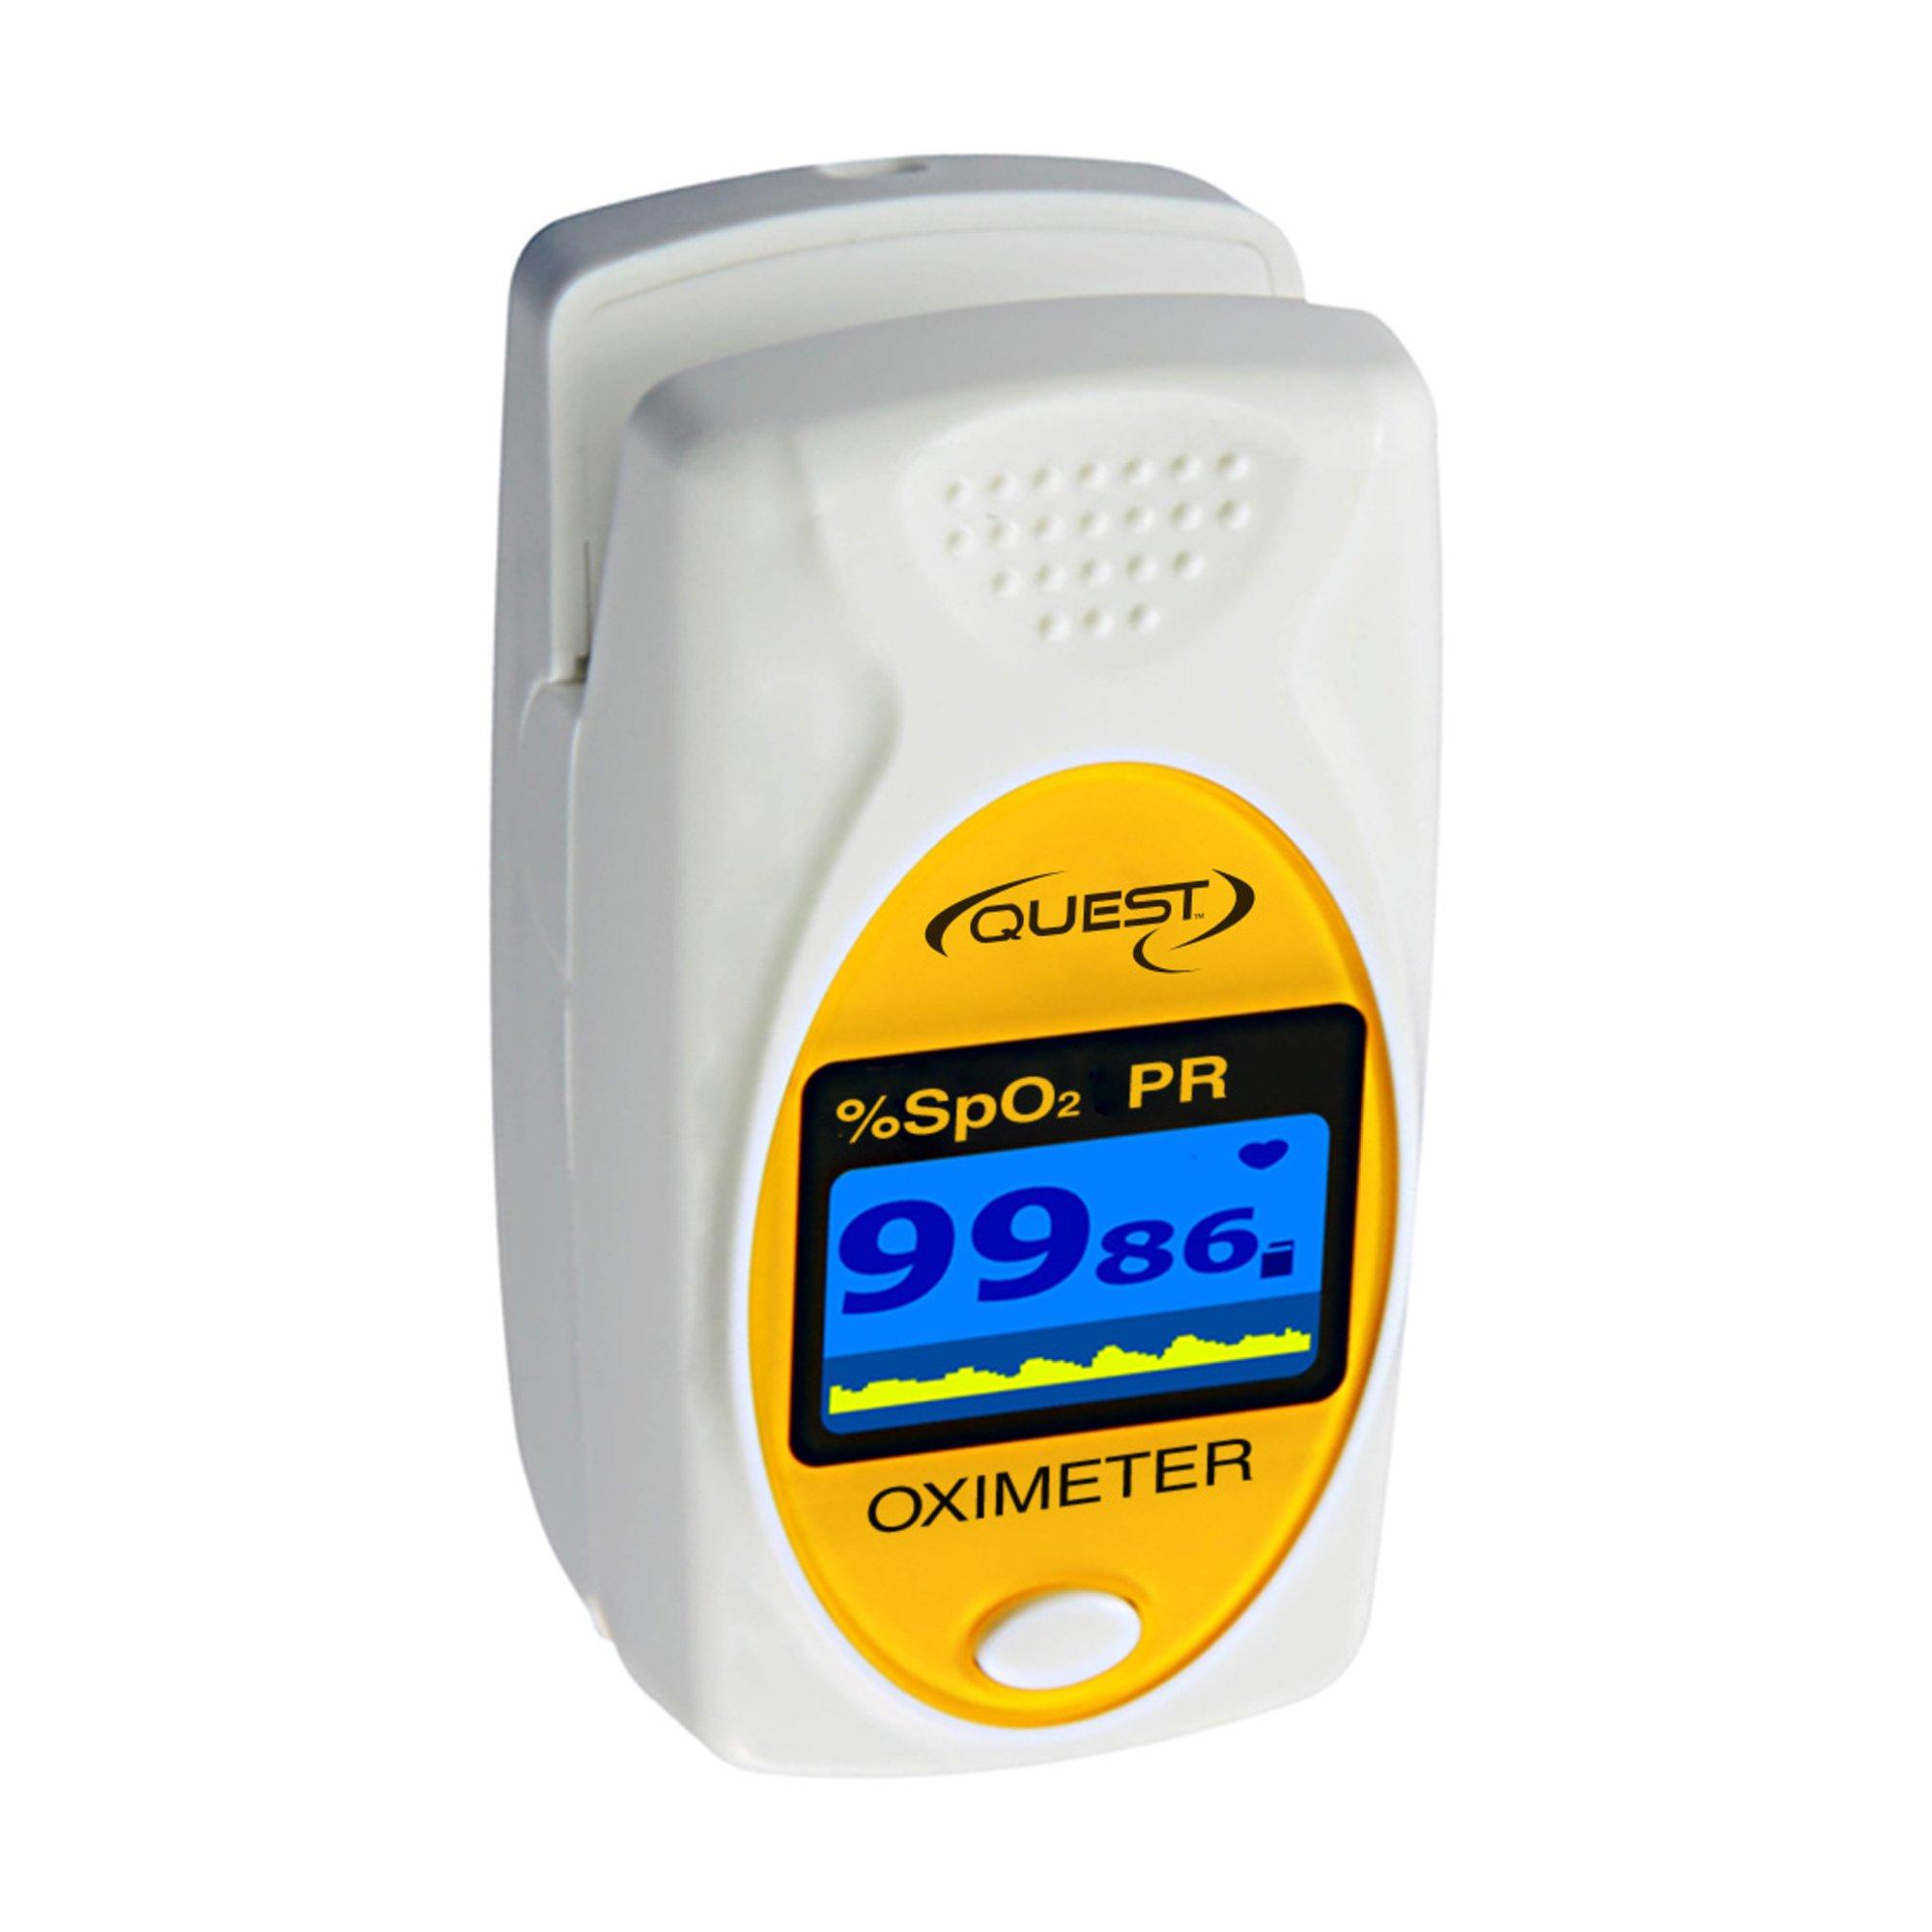 Quest 3-in-1 Pulse Oximeter